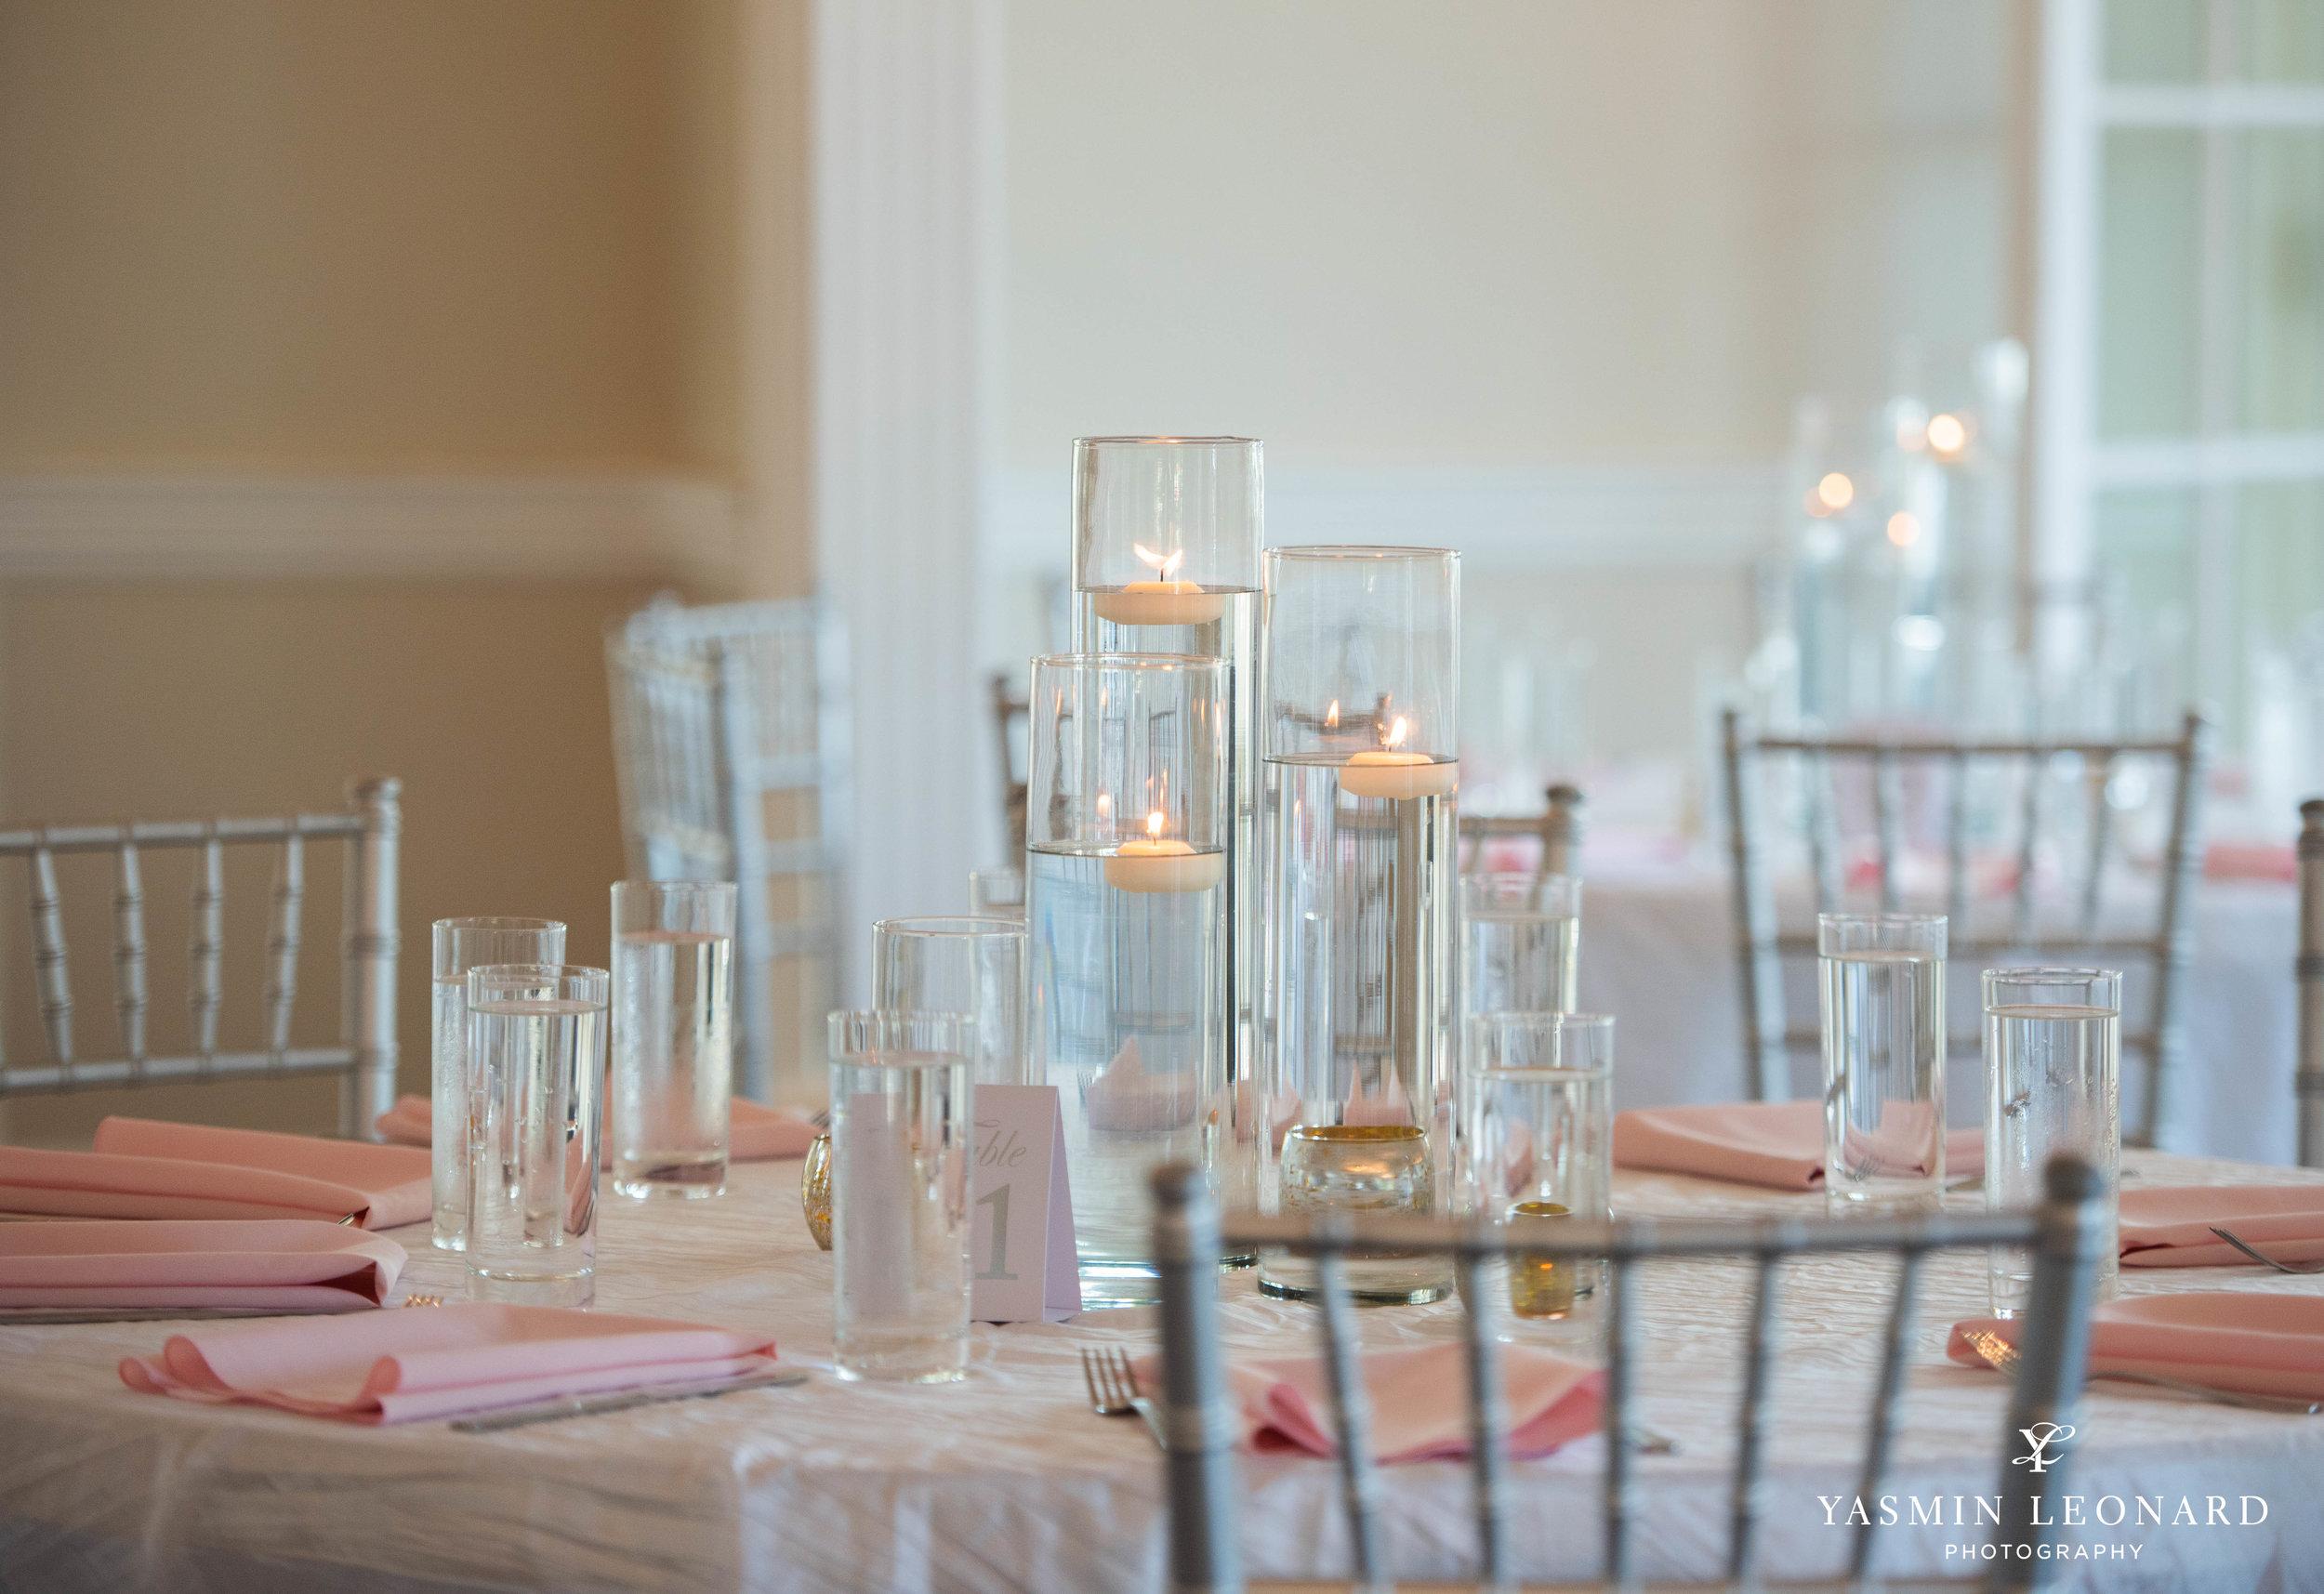 Separk Mansion - NC Weddings - Gastonia Wedding - NC Wedding Venues - Pink and Blue Wedding Ideas - Pink Bridesmaid Dresses - Yasmin Leonard Photography-39.jpg